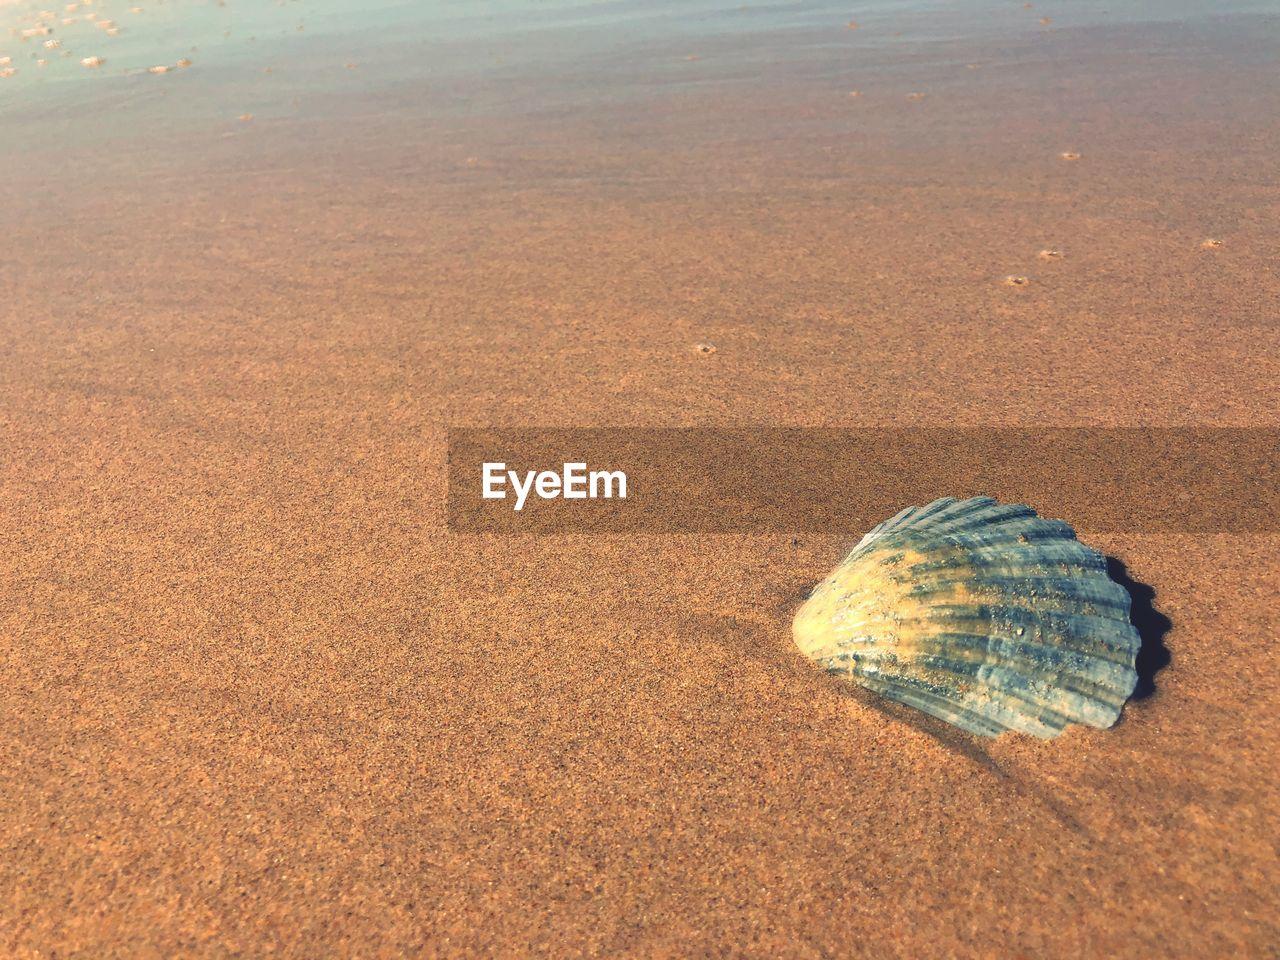 sea, land, shell, beach, animal wildlife, sand, water, nature, animal, animal shell, no people, seashell, day, beauty in nature, animal themes, one animal, high angle view, outdoors, tranquility, marine